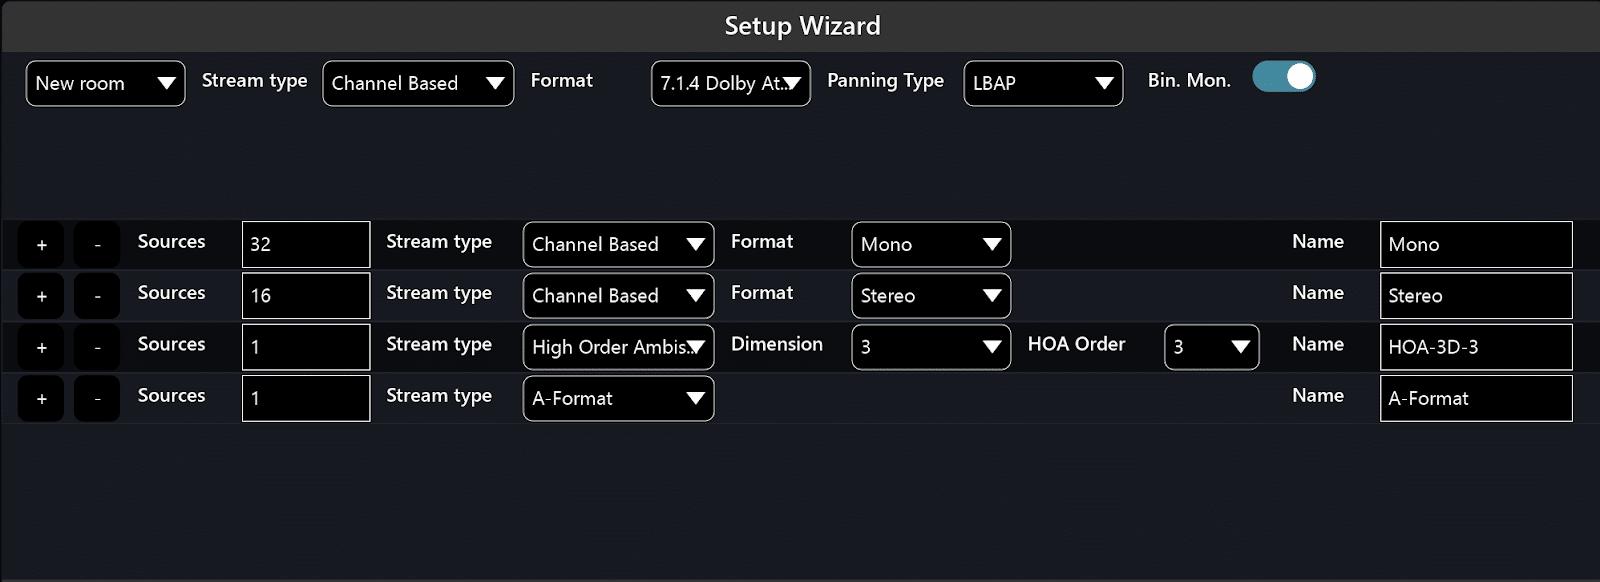 setup-wizardry